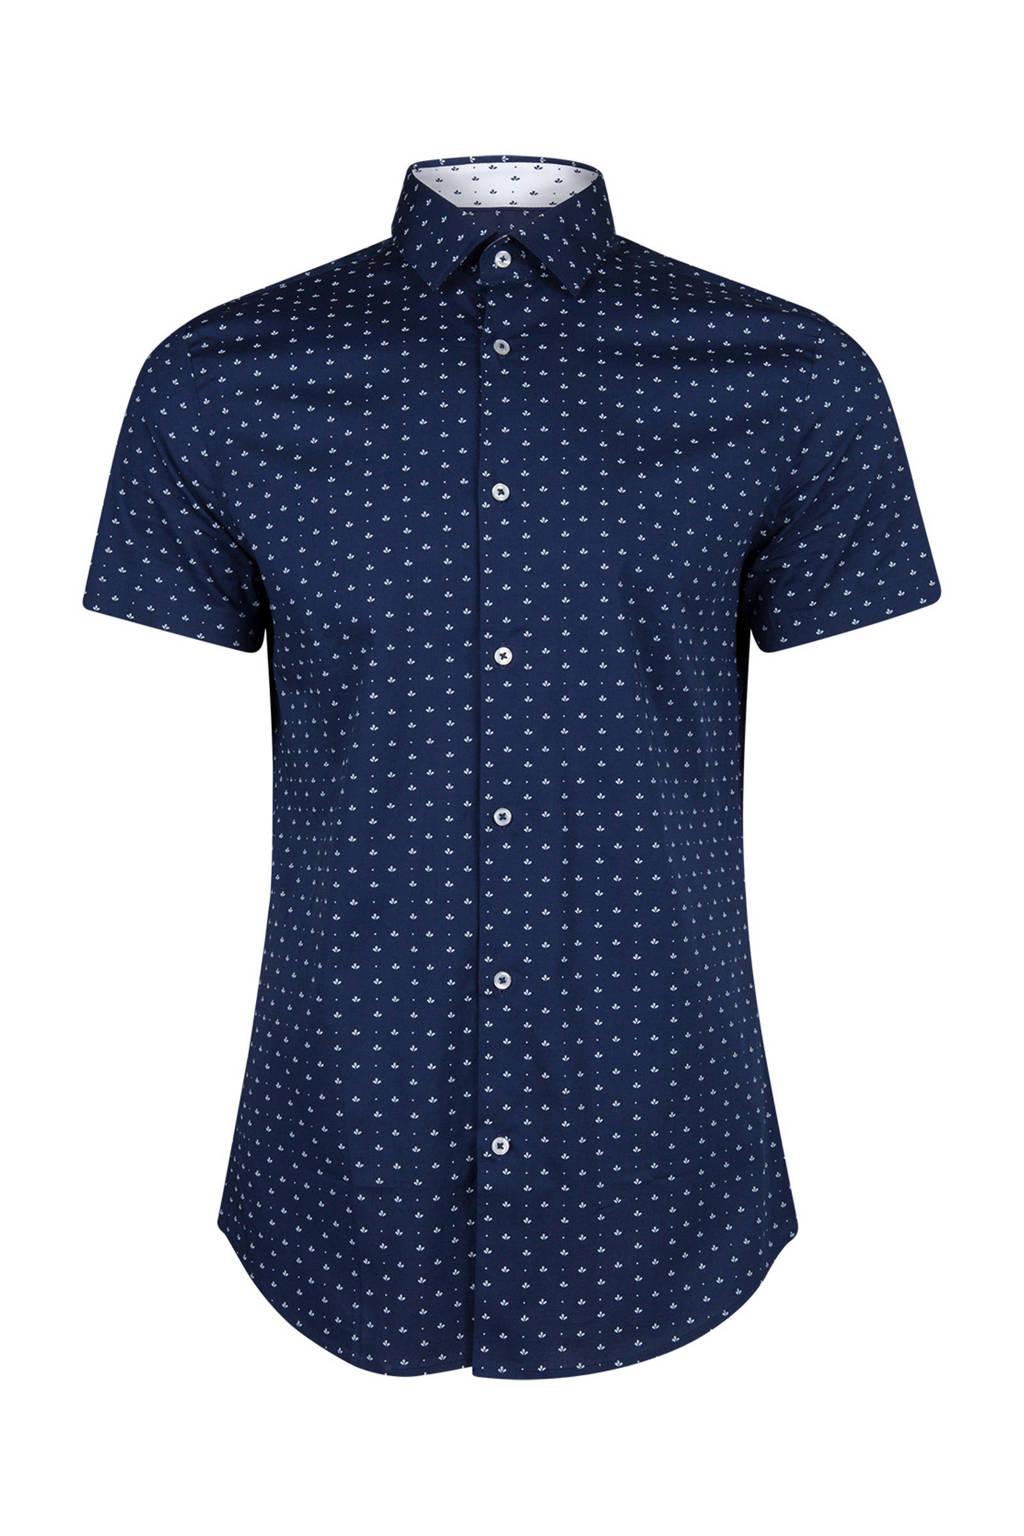 WE Fashion slim fit overhemd donkerblauw, Donkerblauw